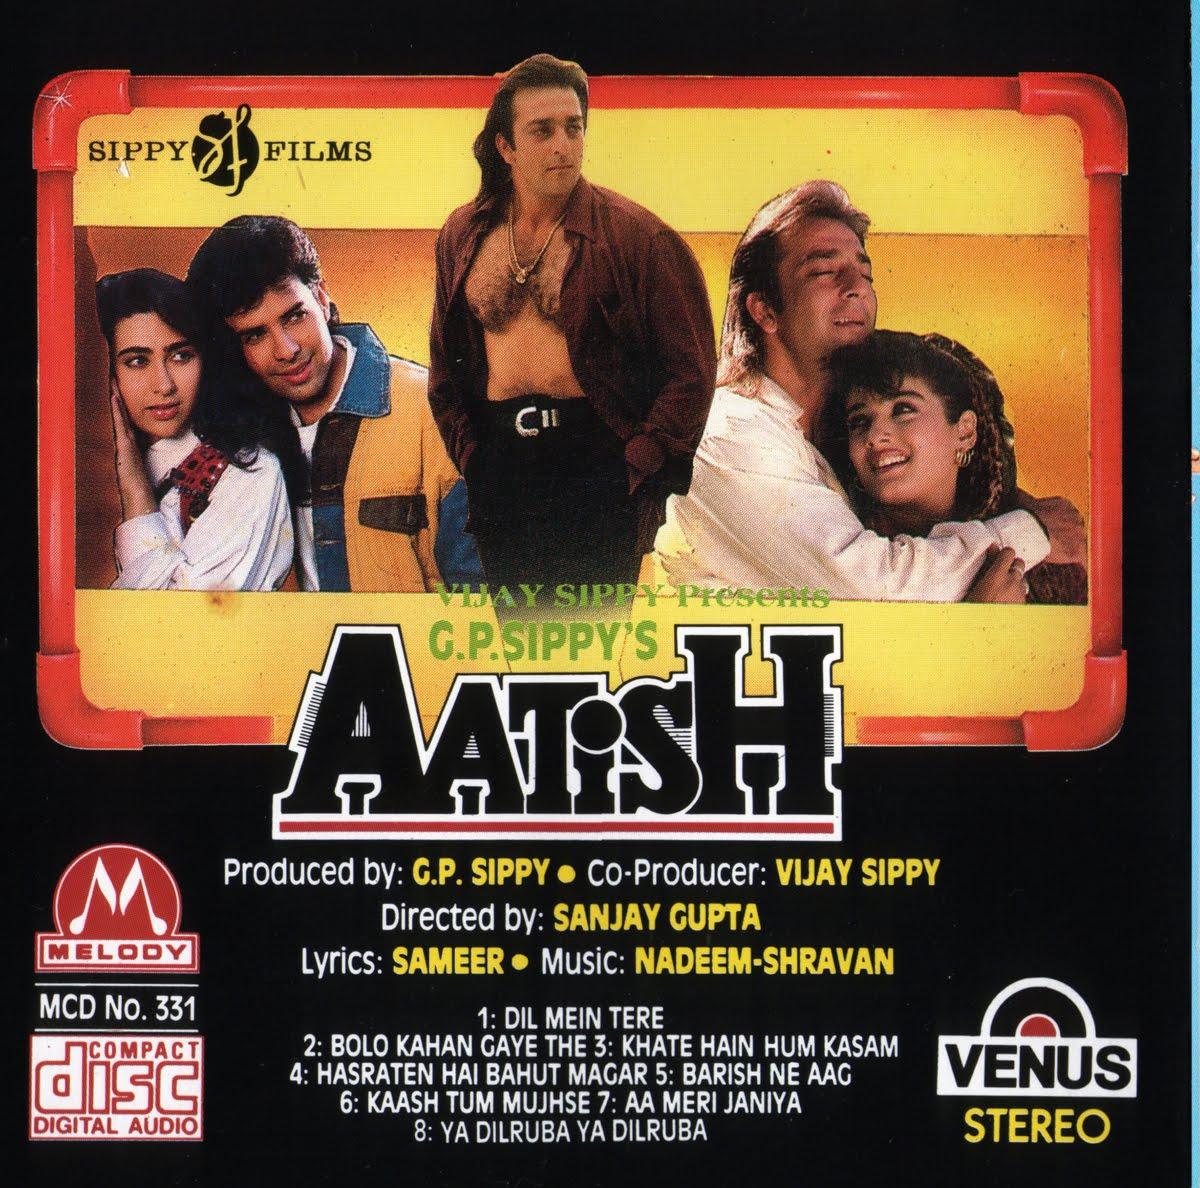 Bollywood Sheet Music September 2011: Renas.tk Mp3 (TKR): Aatish [1994-MP3-VBR-320Kbps]